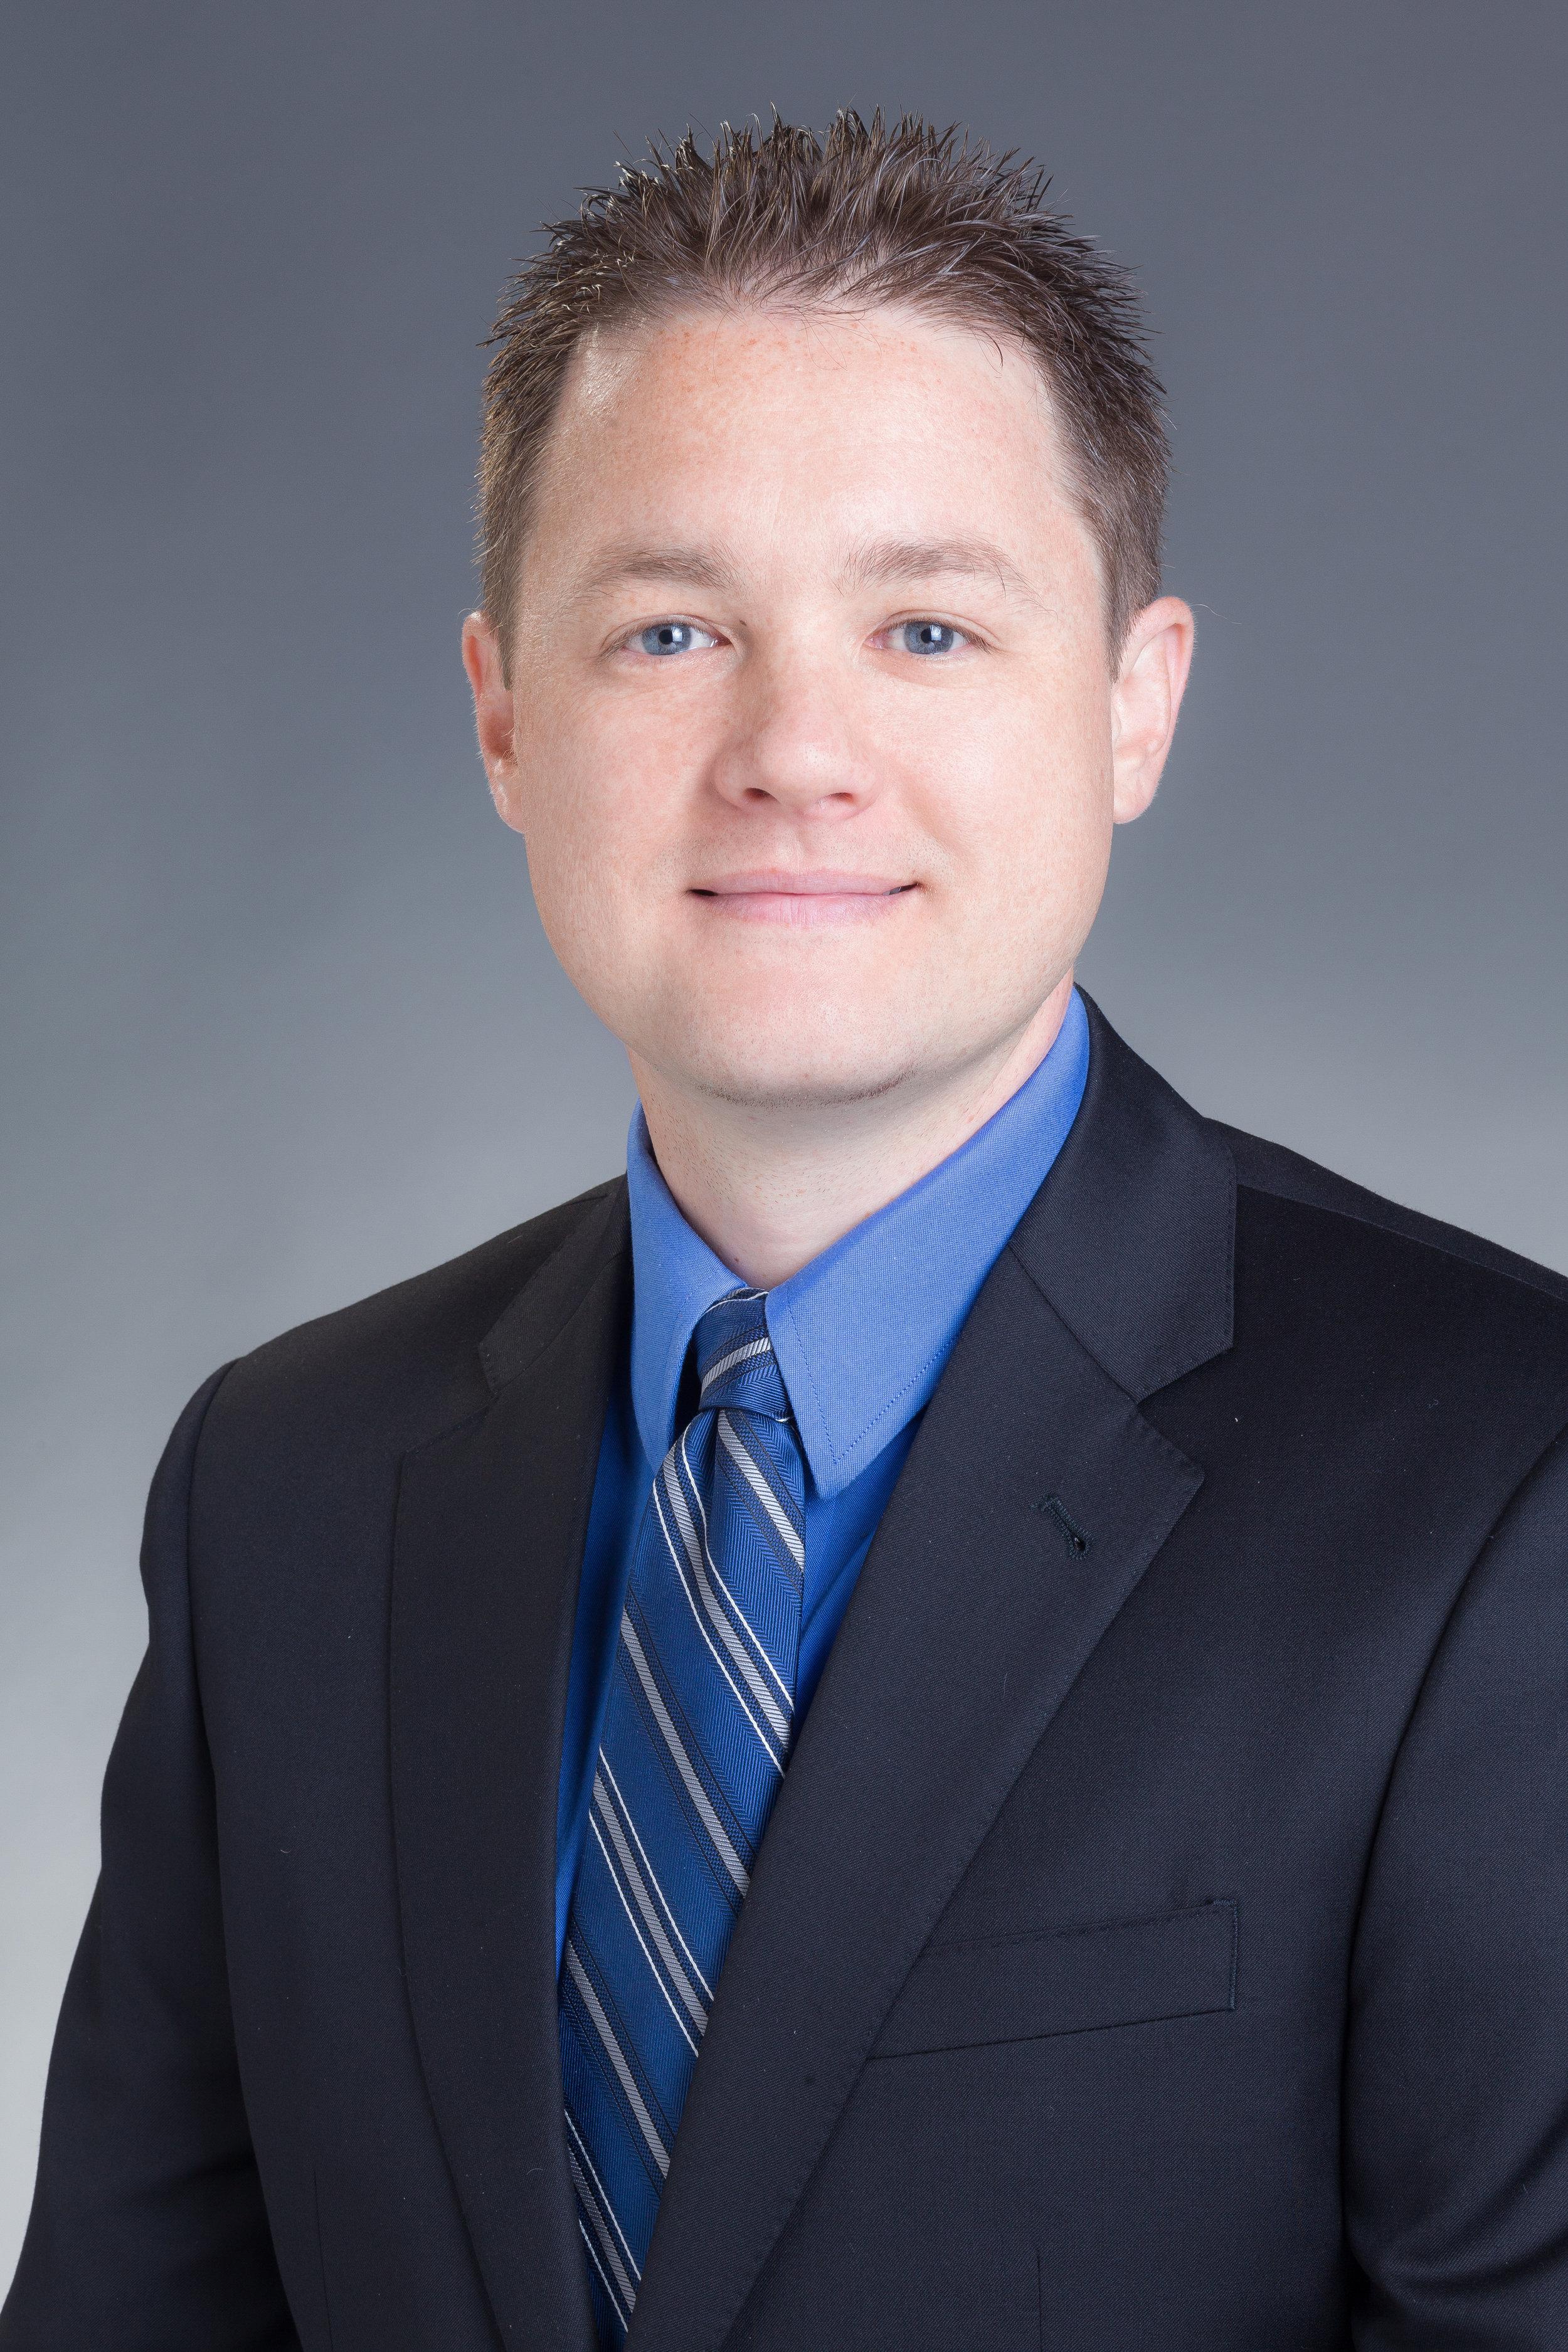 Brian Dunlap - President, CEO